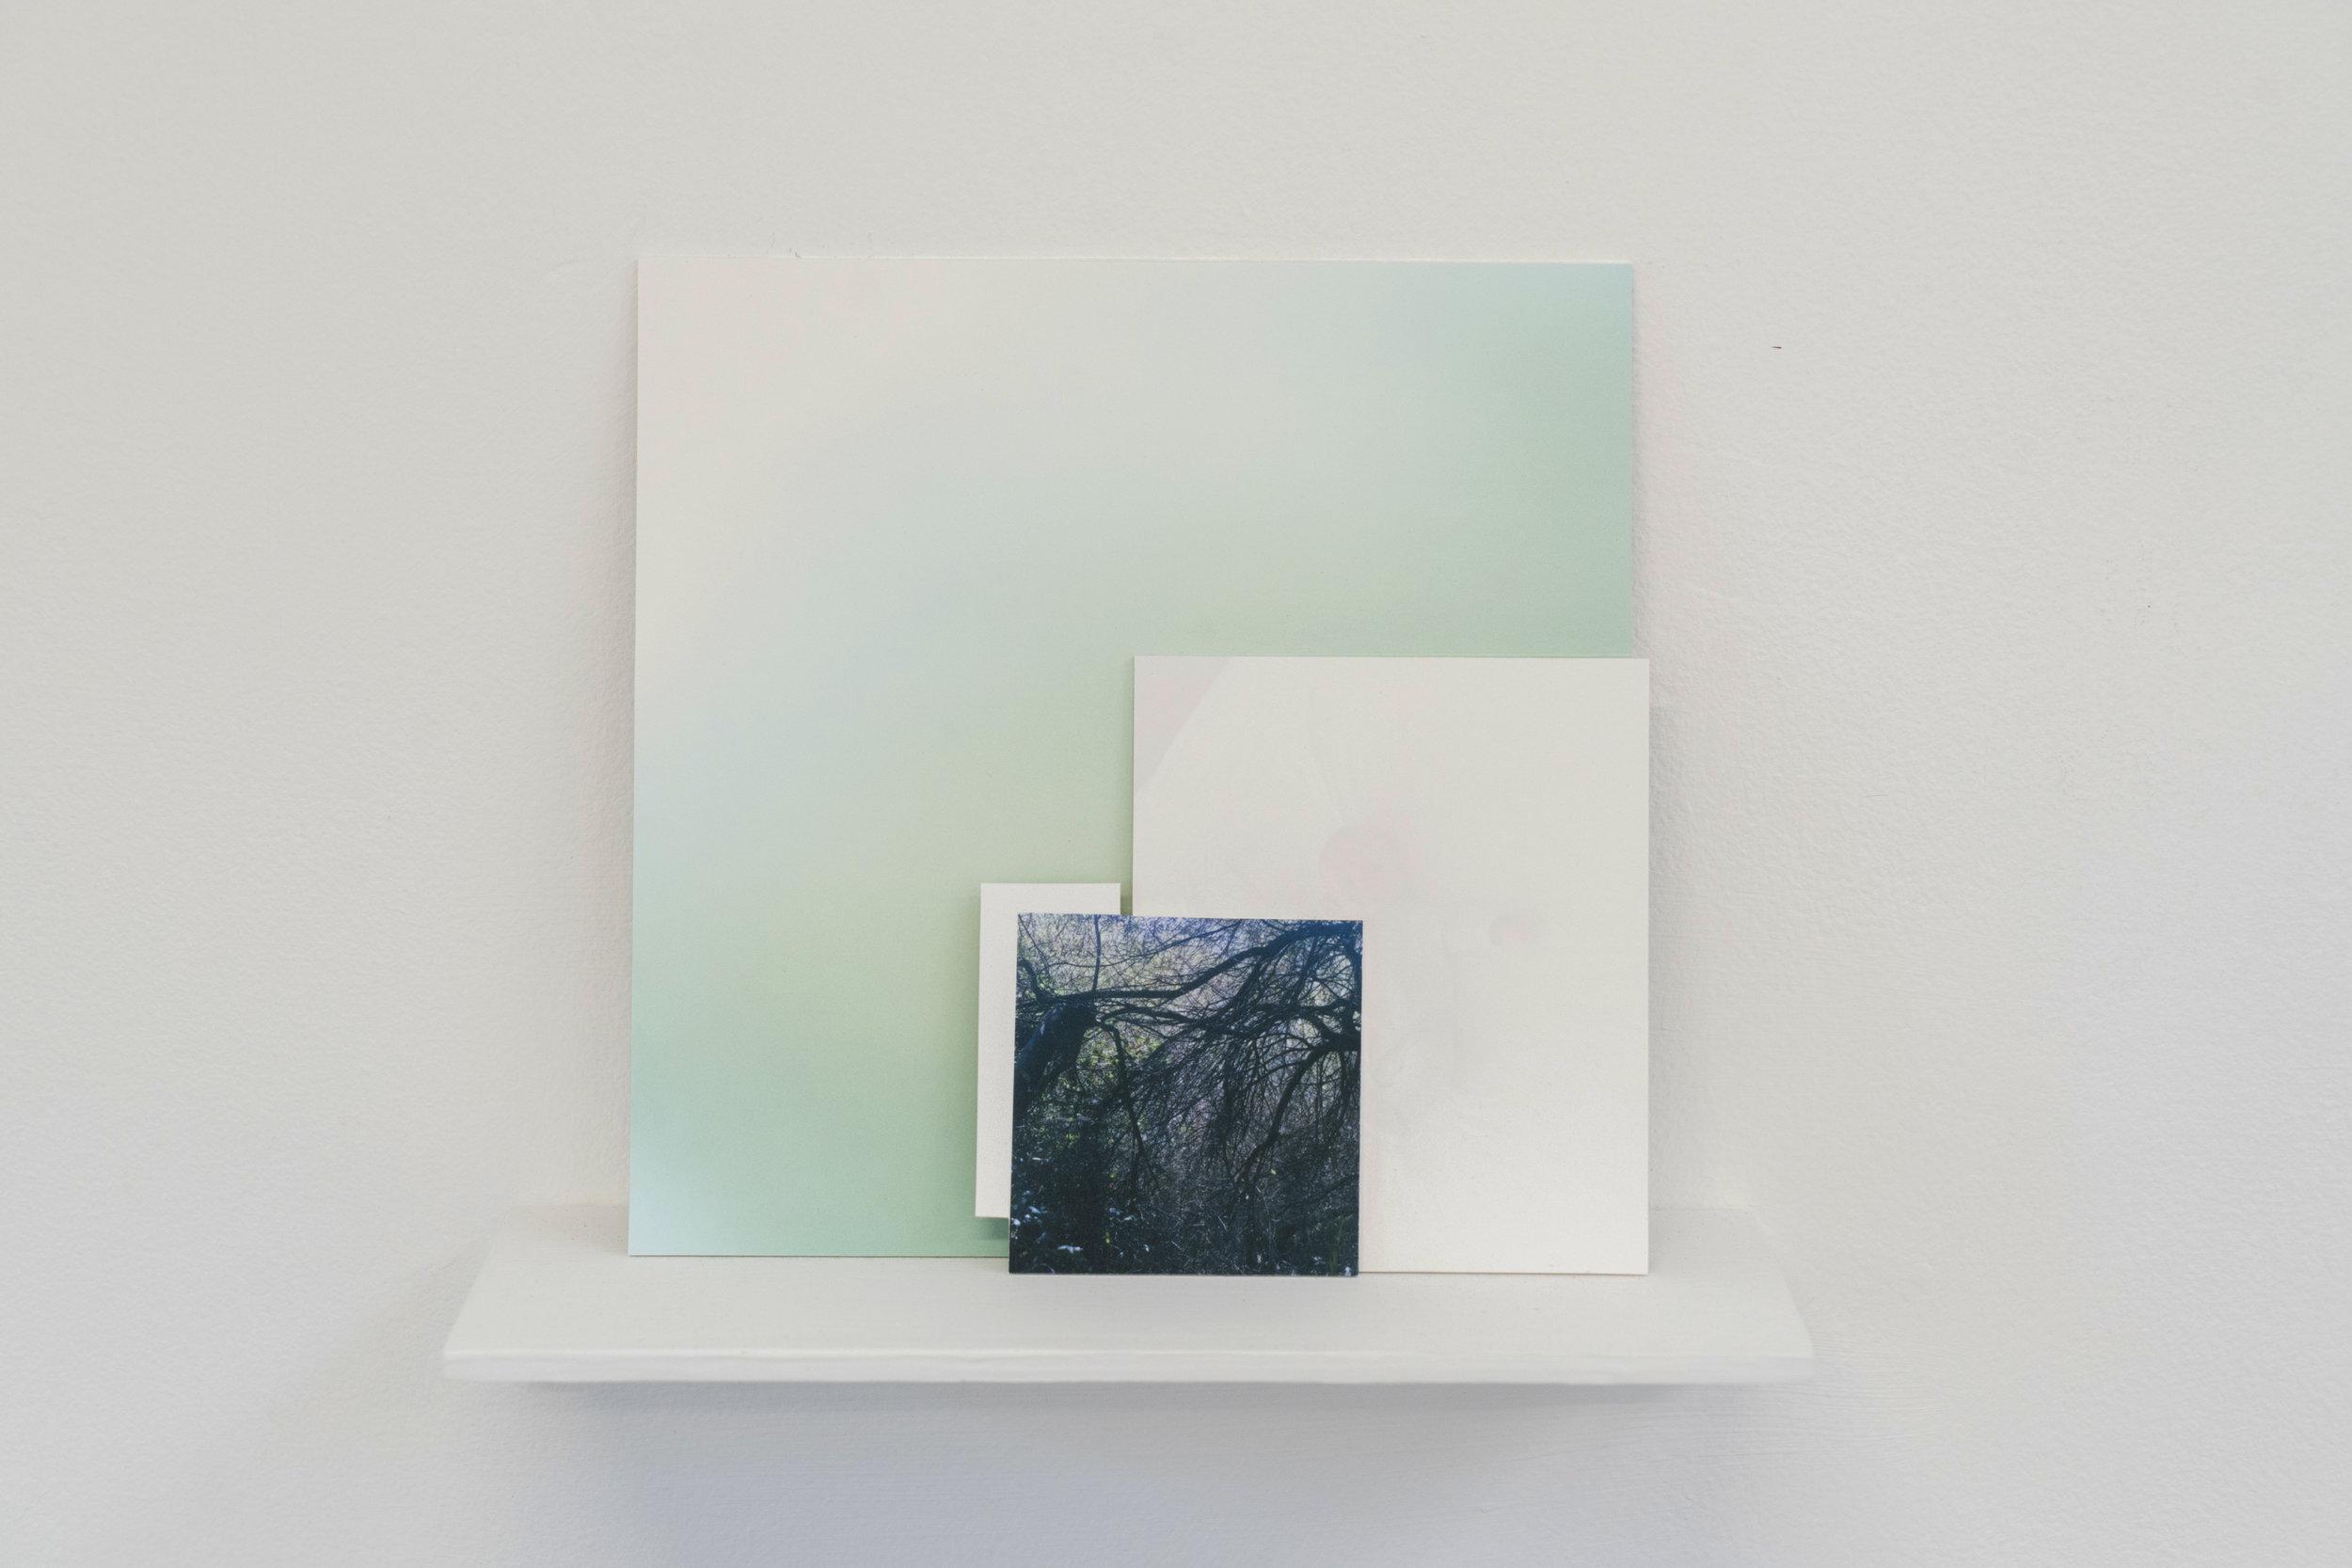 Elizabeth Bernstein,  Something broke…,  2017, Archival pigment print, aluminum, wood, 10 x 8 x 3 inches.